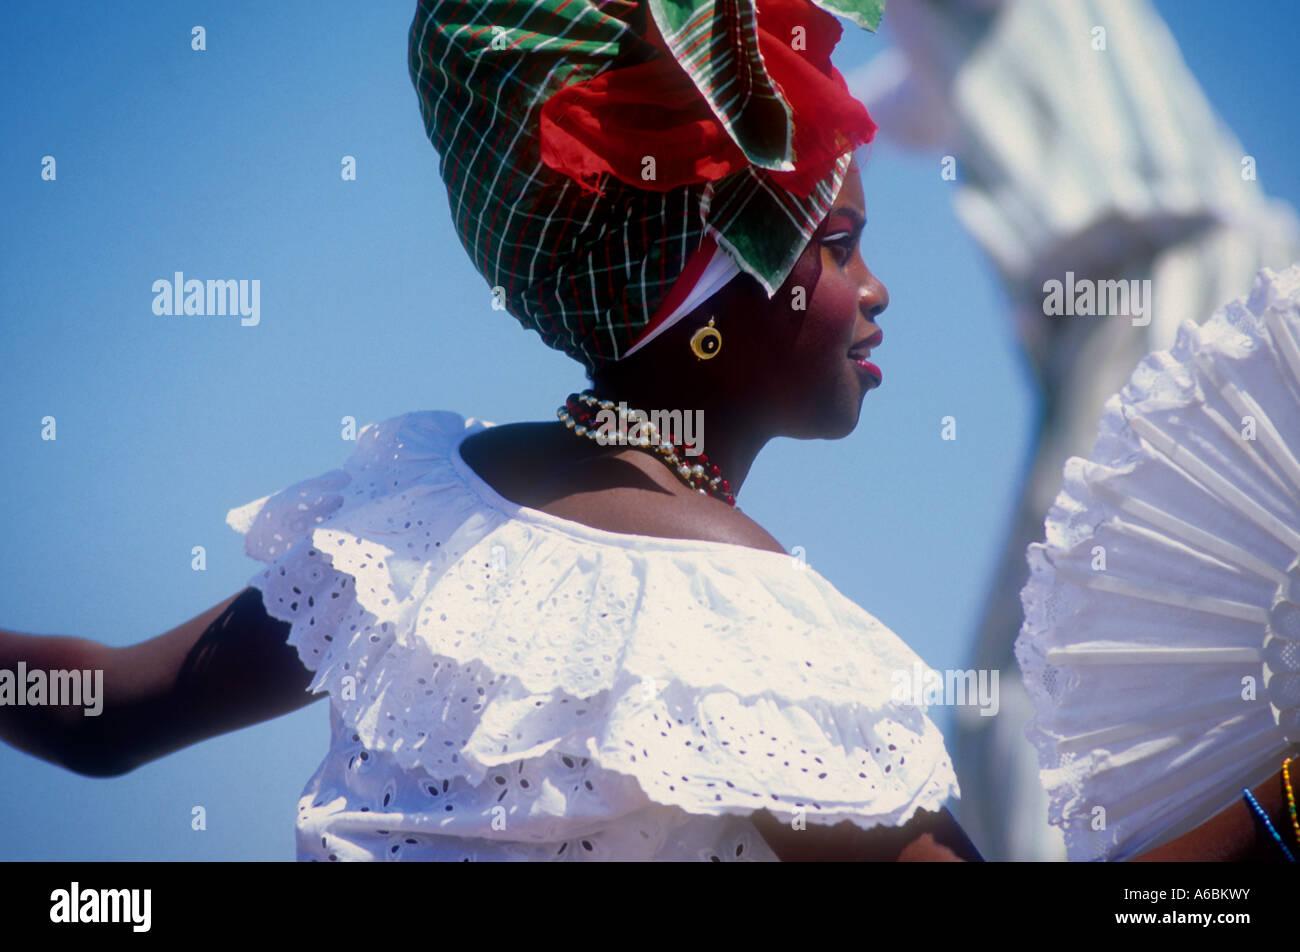 Caribbean Dancer - Stock Image